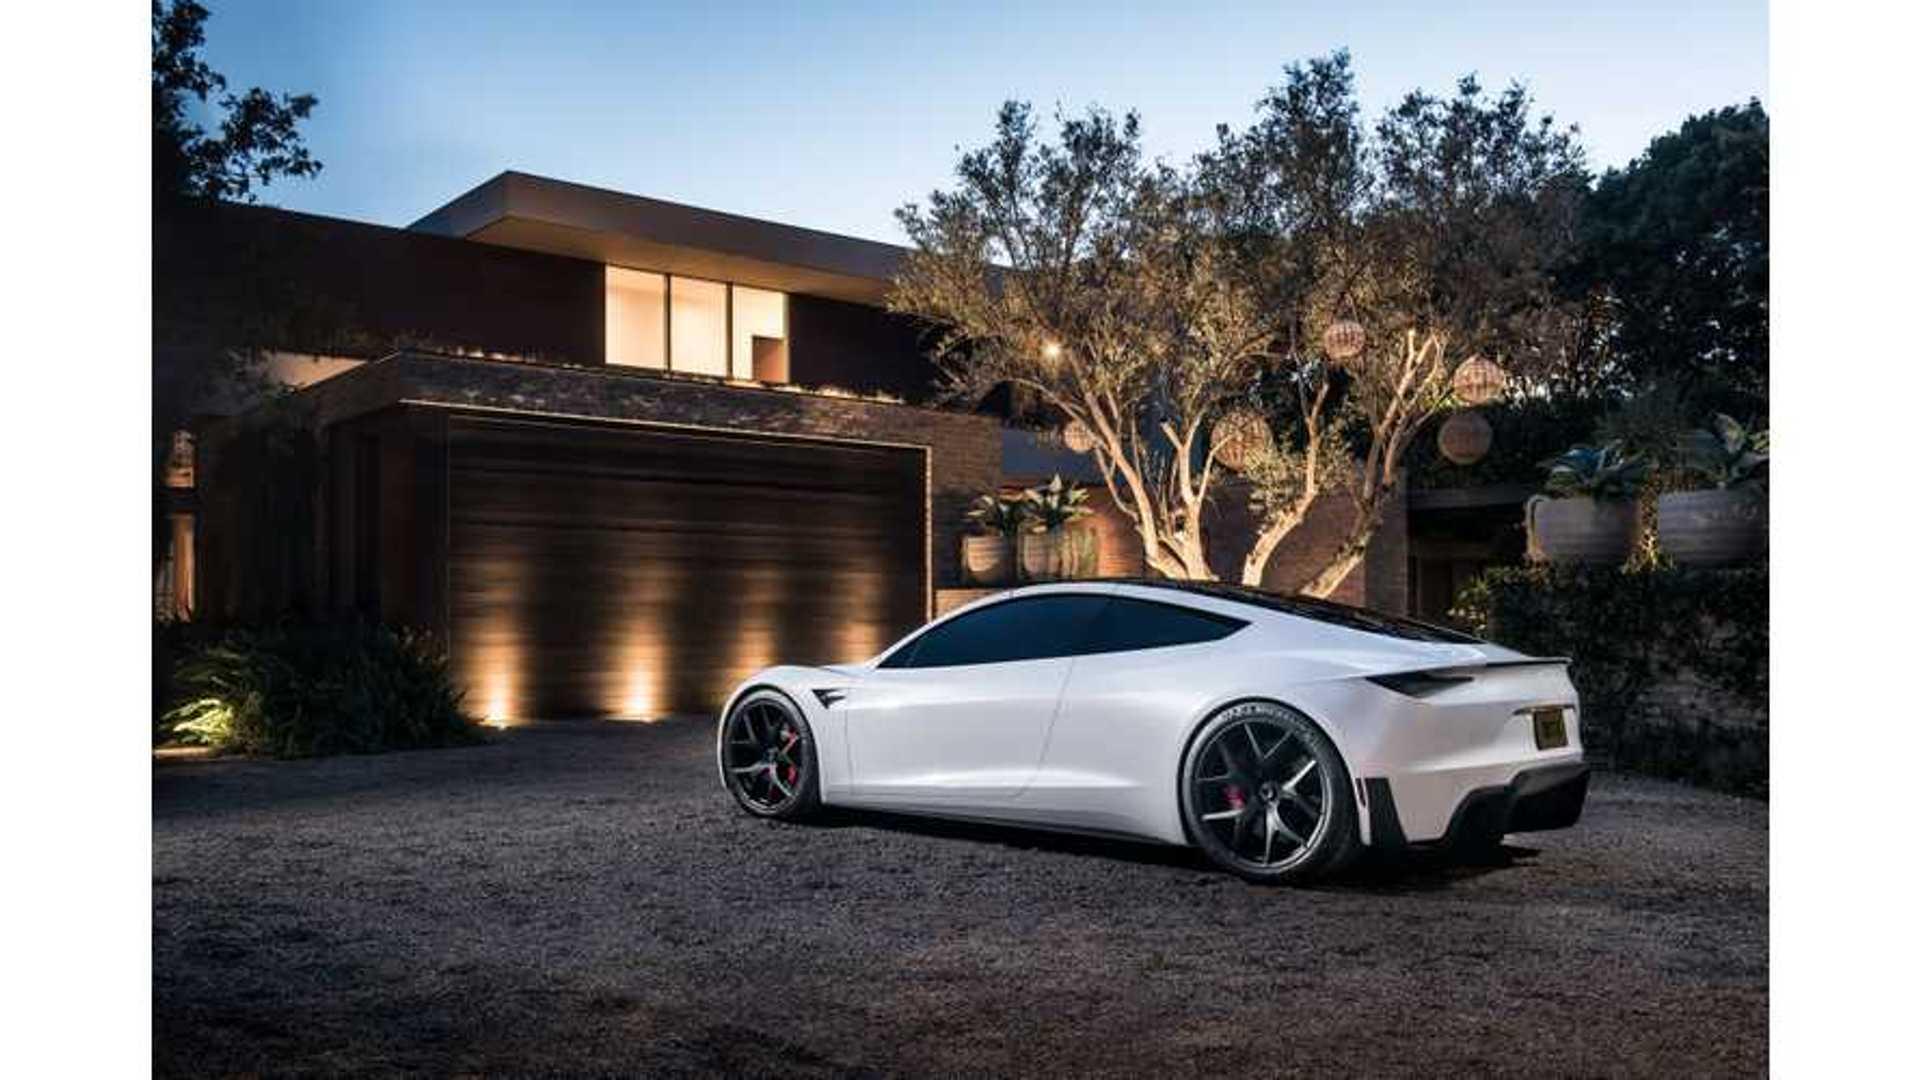 Tesla Roadster Delights Us In New Images Wallpaper Video